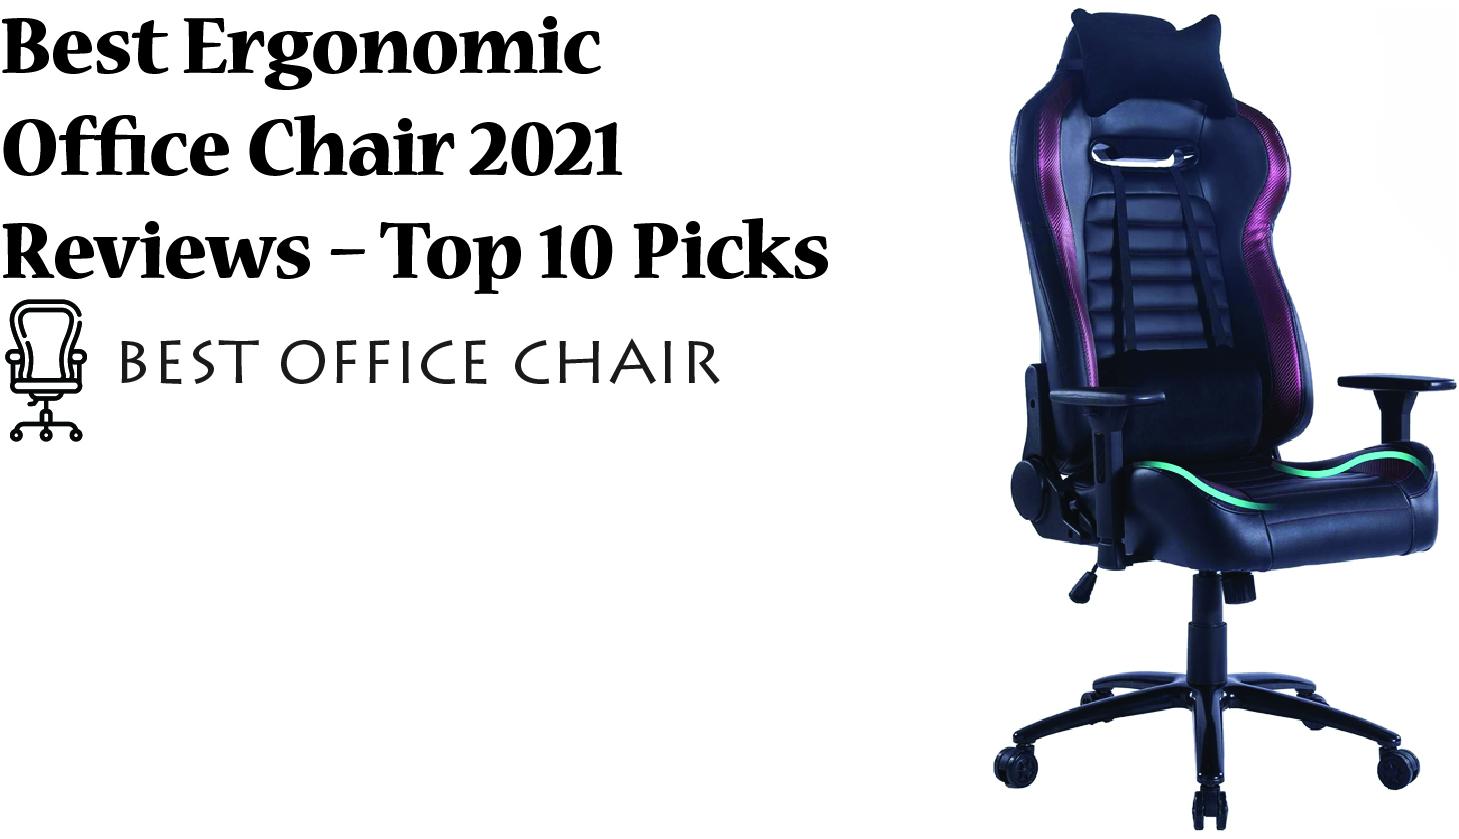 Best Ergonomic Office Chairs 2021